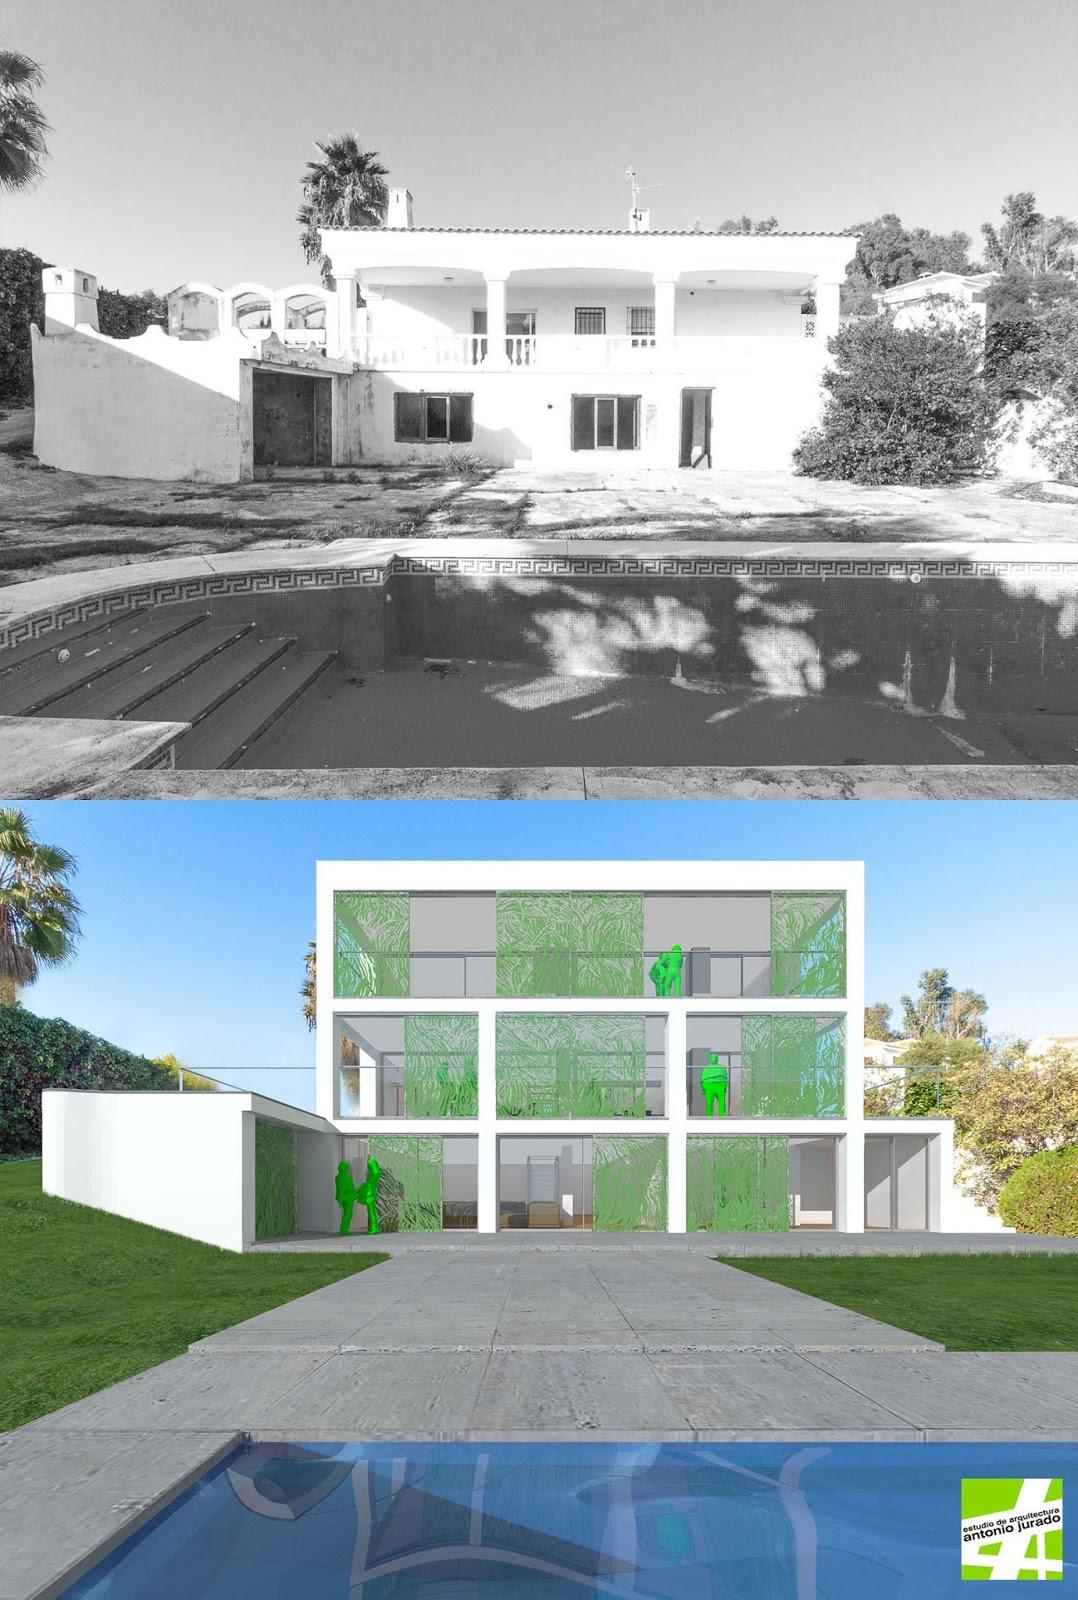 vivienda-unifamiliar-rosario-marbella-malaga-arquitecto-antonio-jurado-07